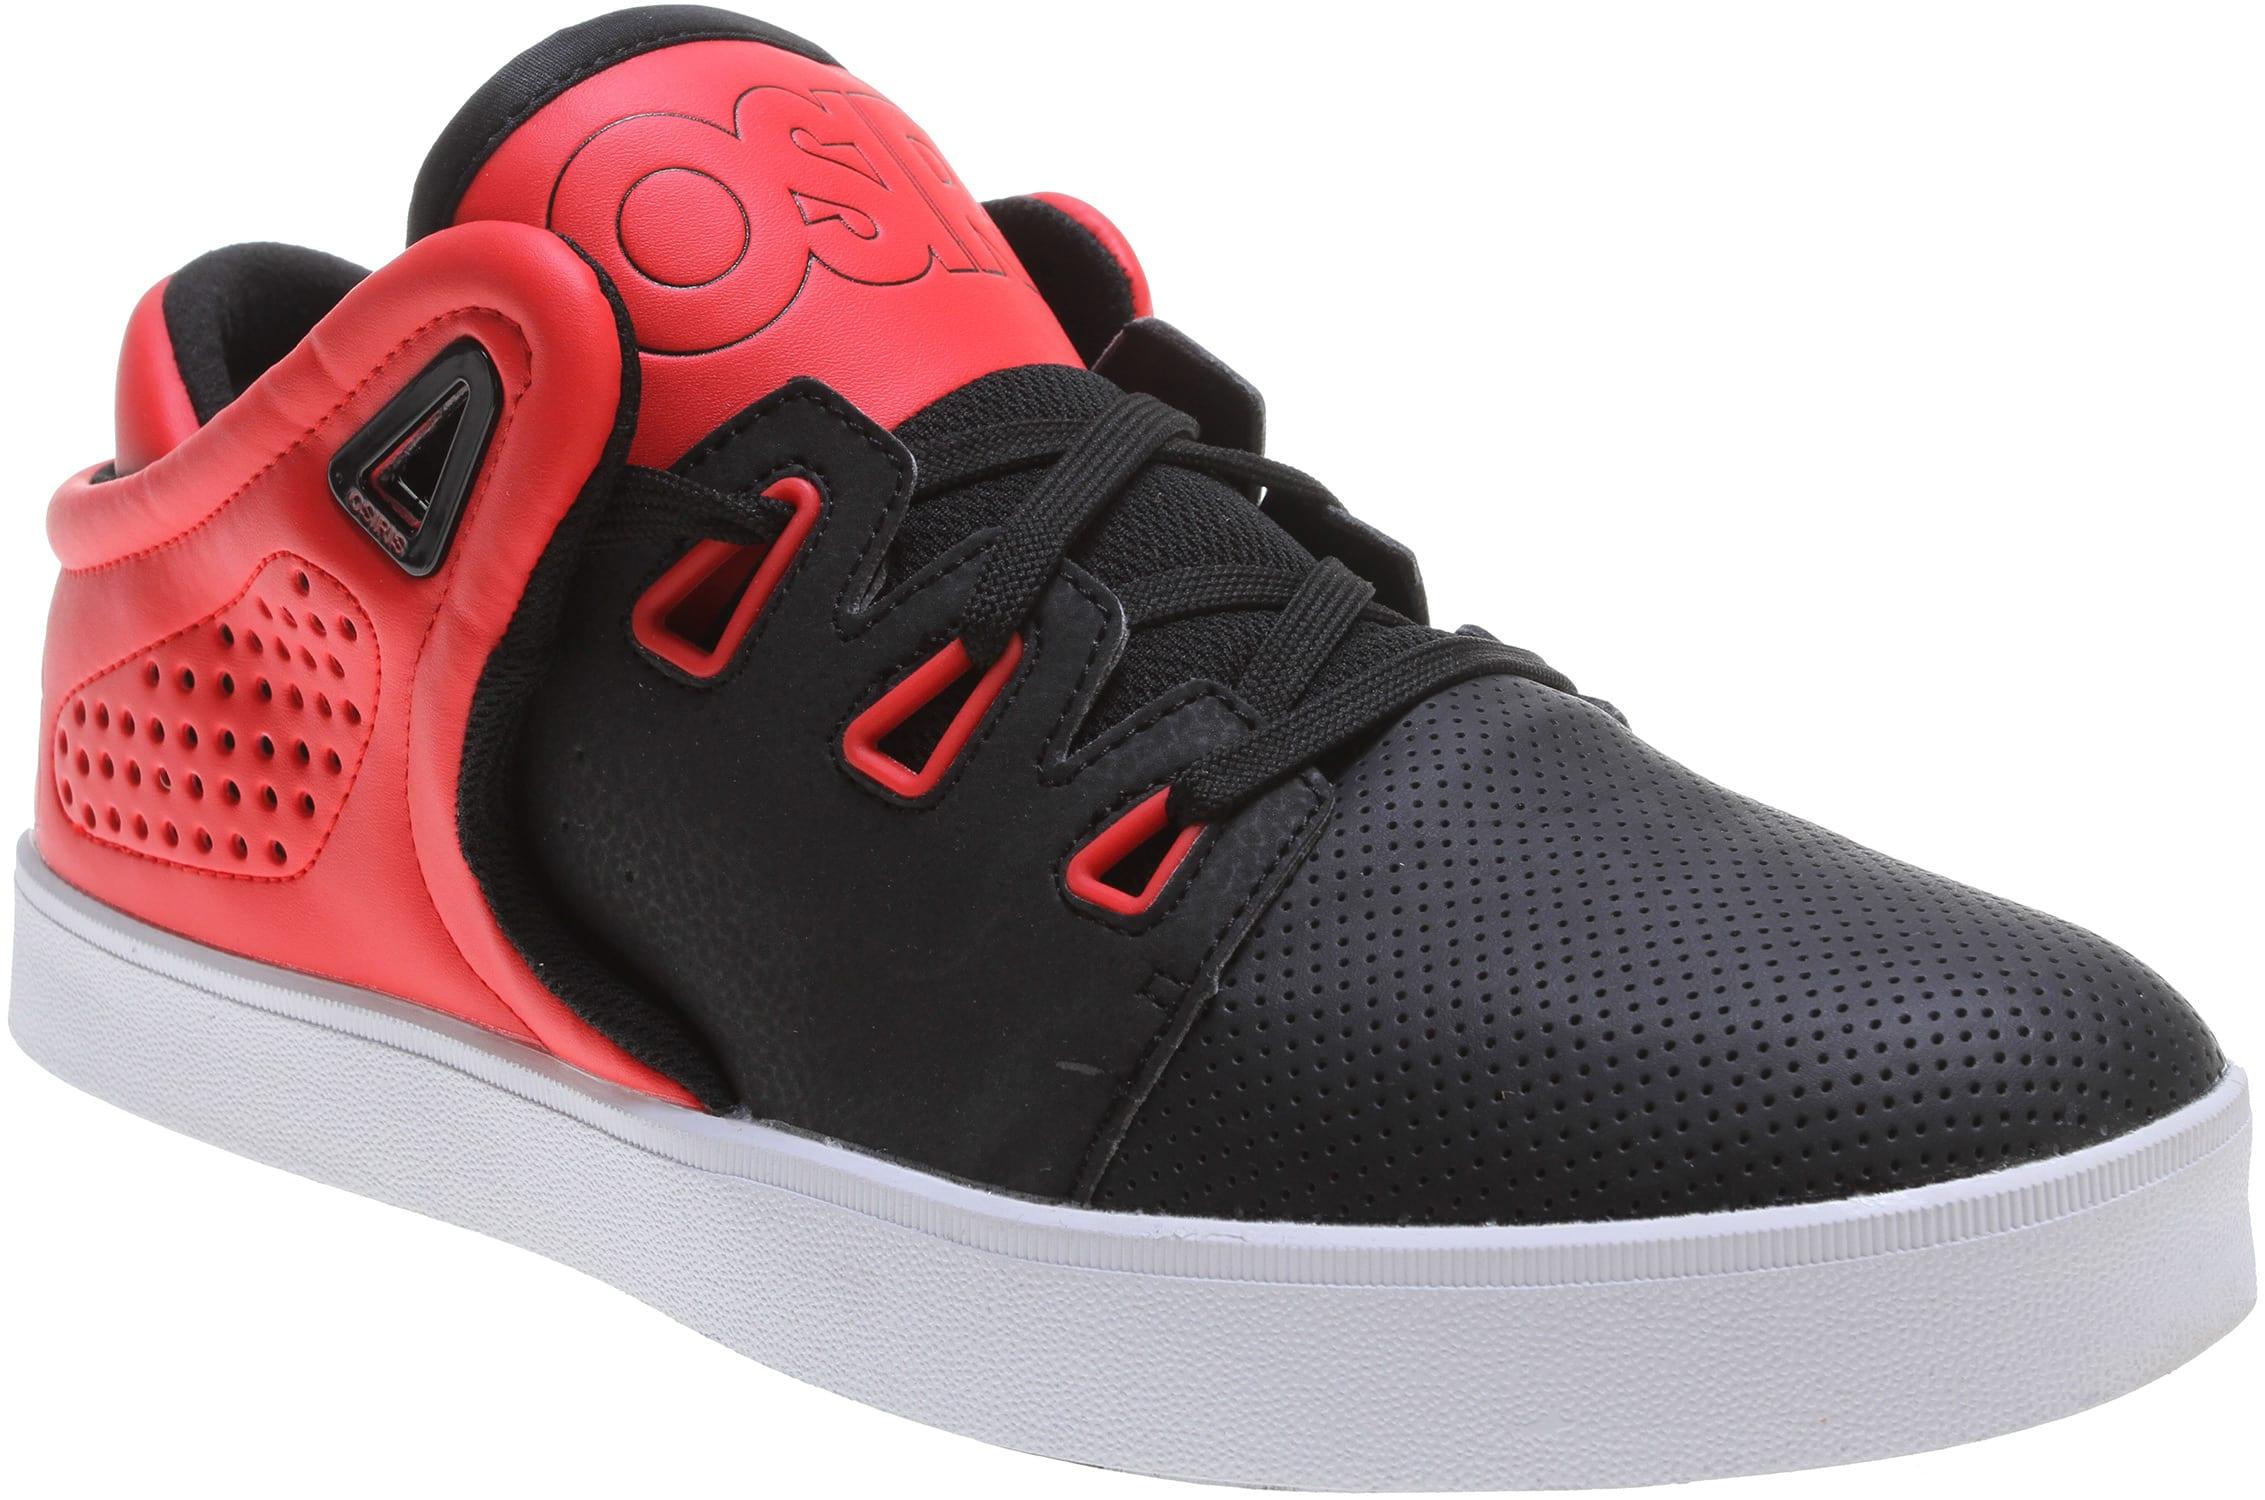 95b8cf57ef Osiris D3V Skate Shoes - thumbnail 2